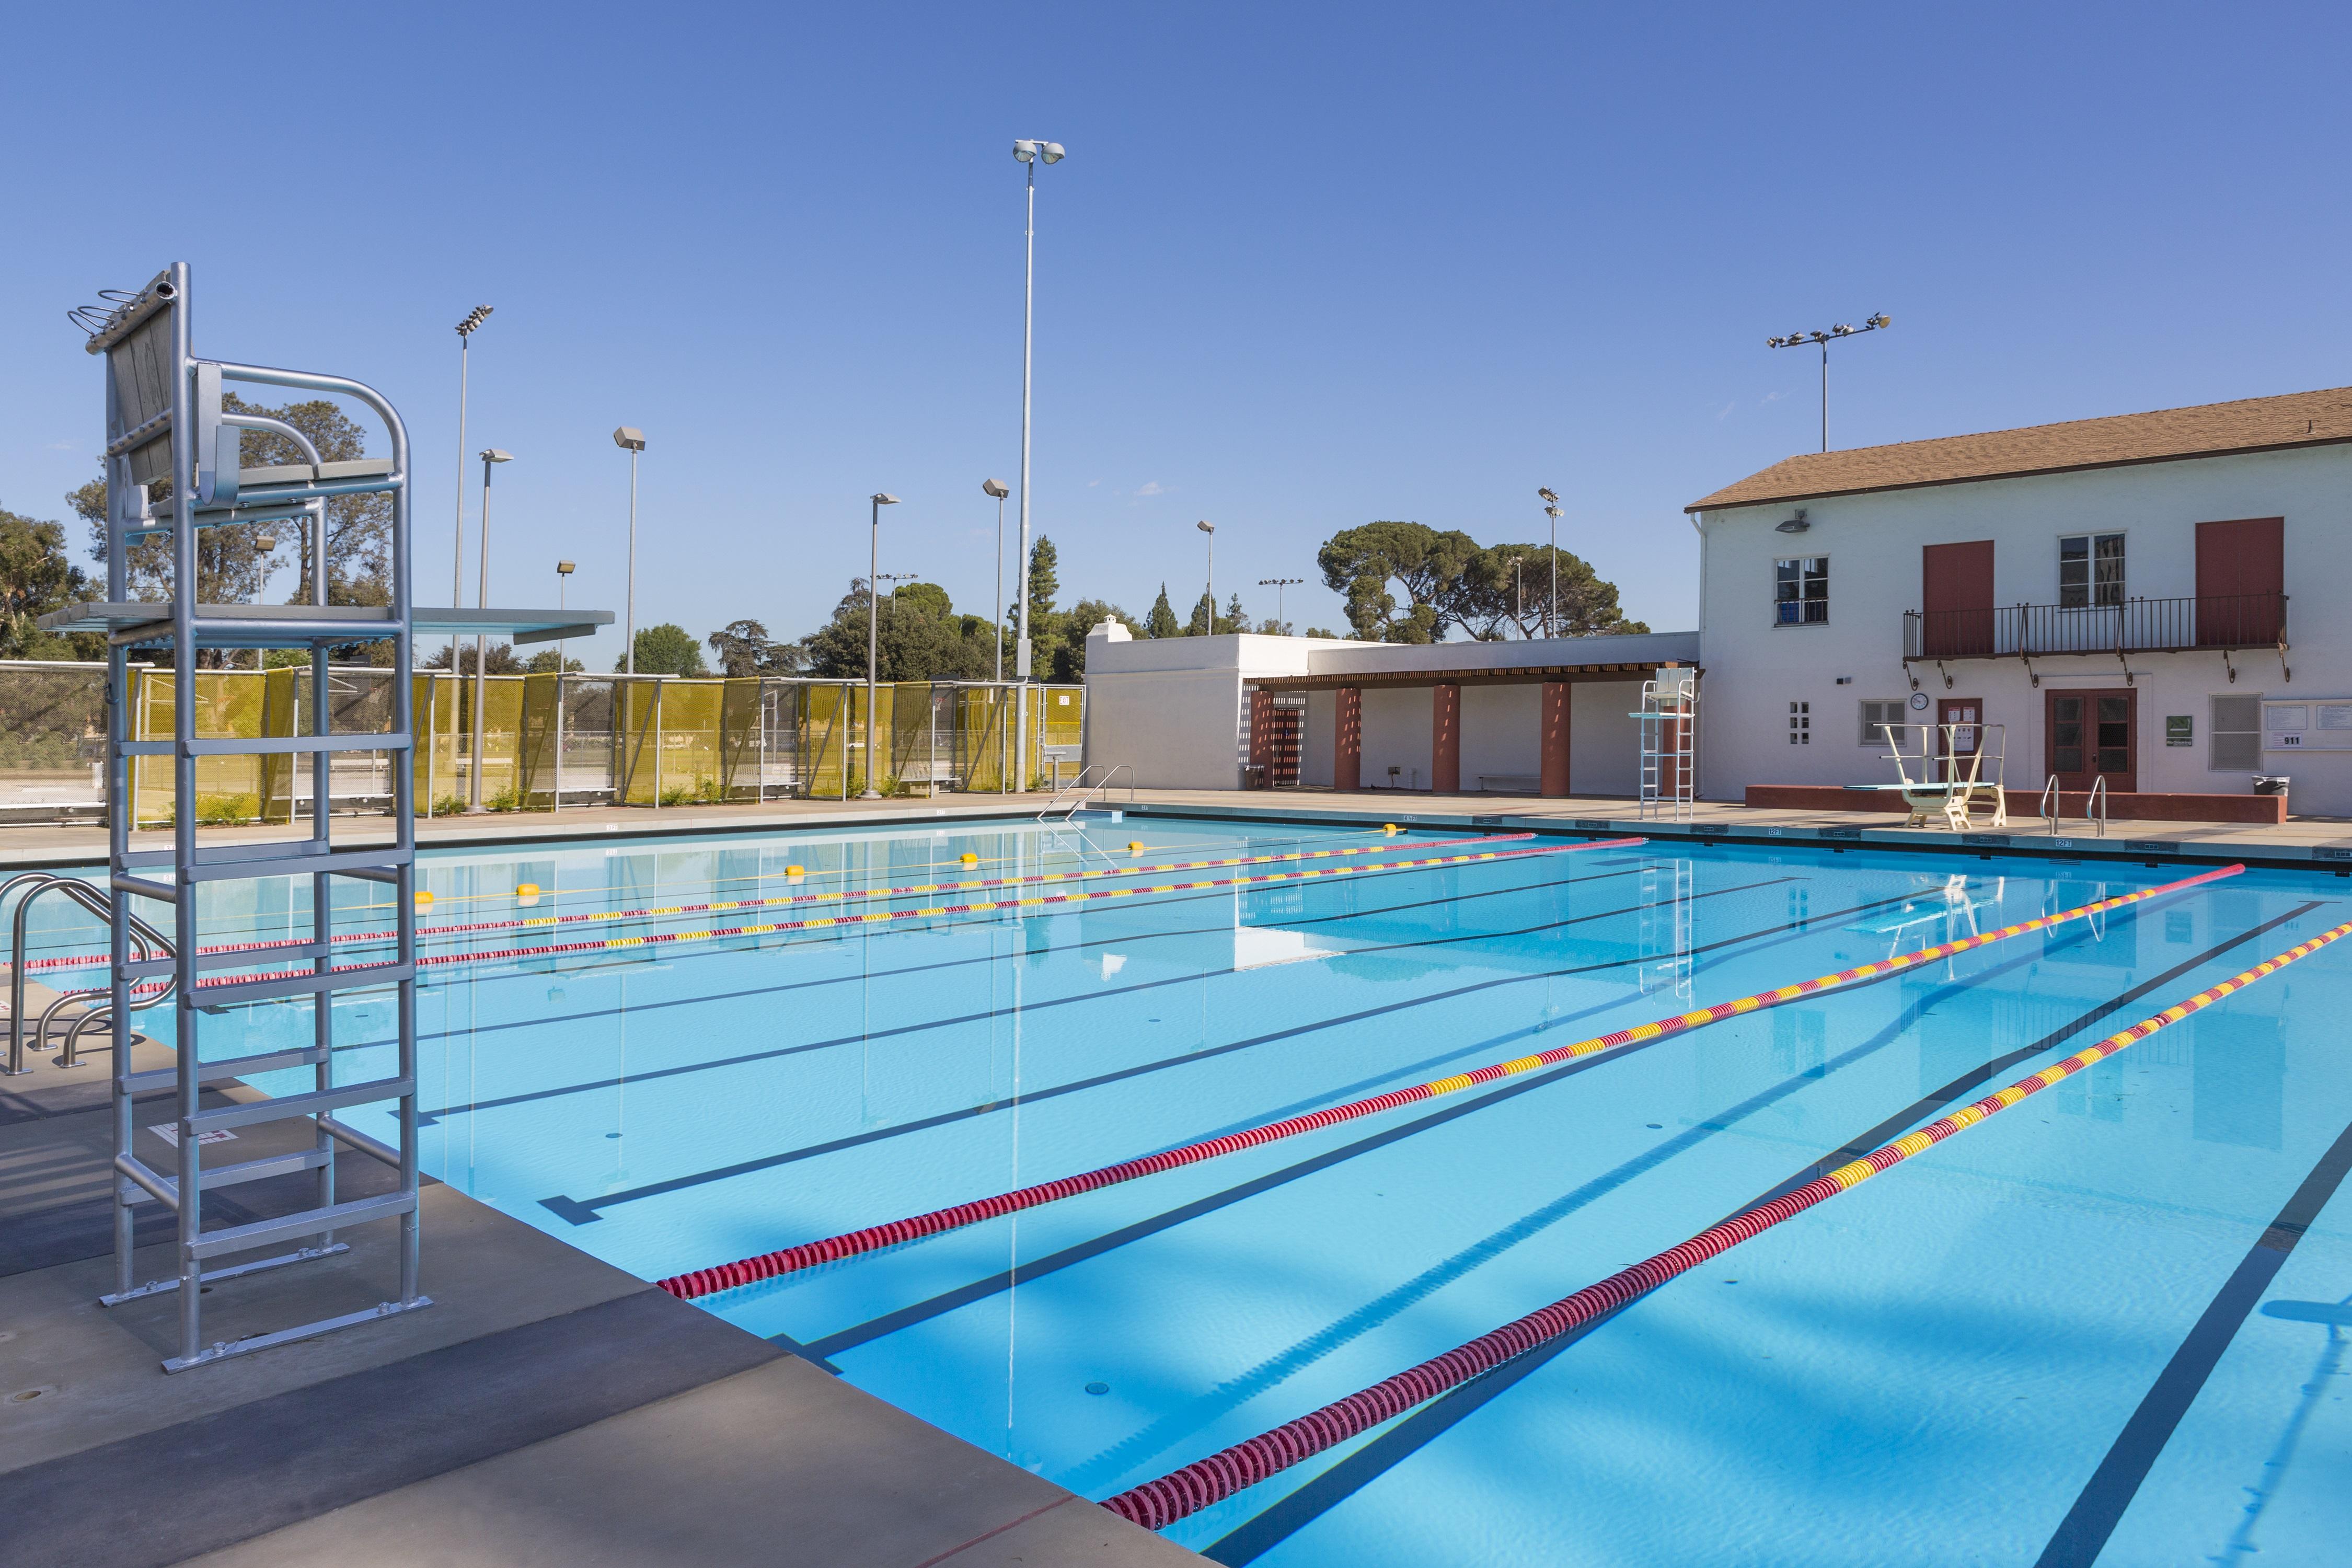 Reseda Park Pool & Bathhouse